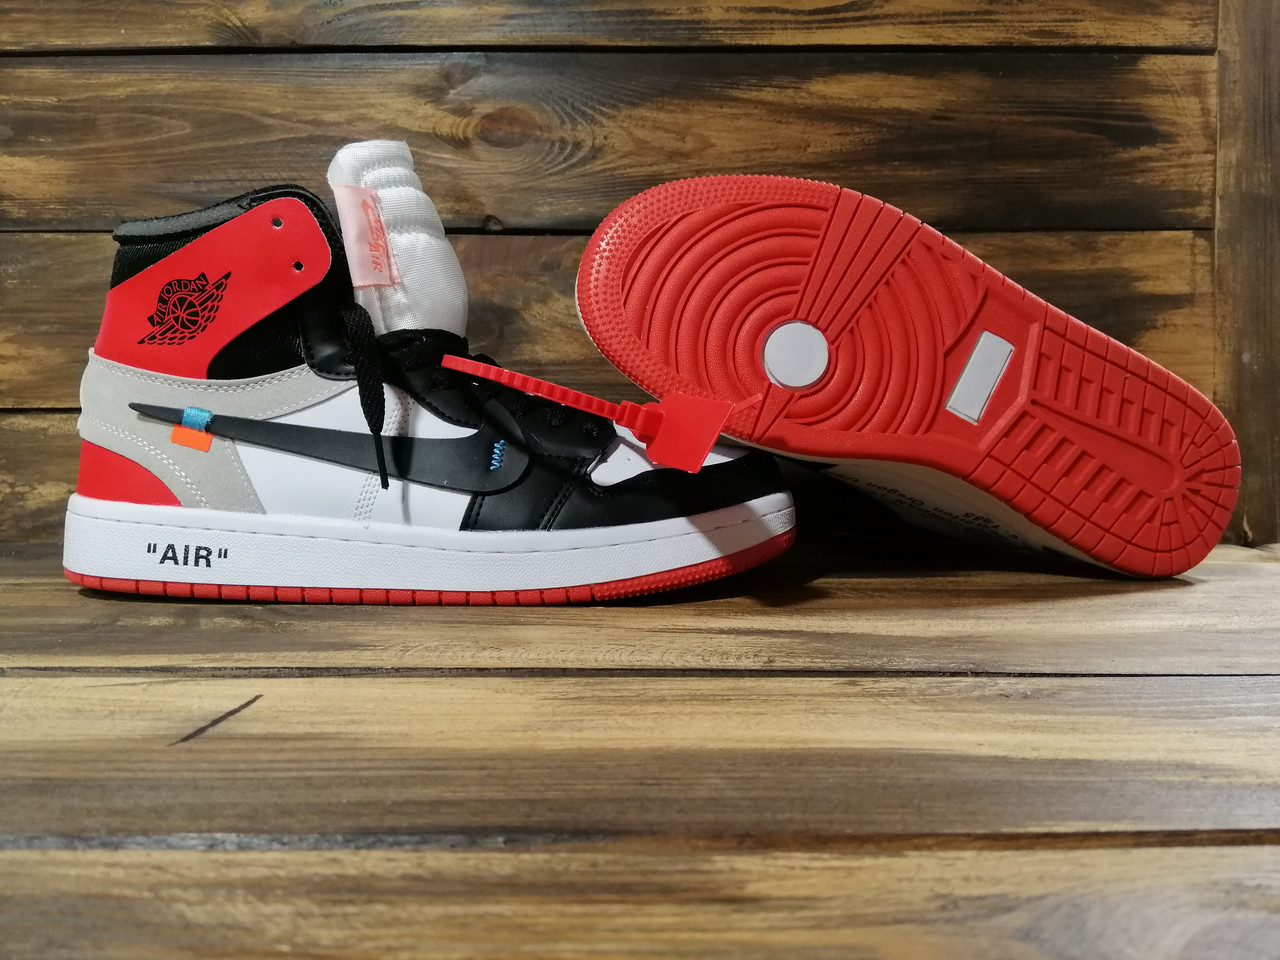 393584e2 Кроссовки мужские белые эко кожа Nike Air Jordan Off-White, цена 990 грн.,  купить в Запорожье — Prom.ua (ID#885743928)